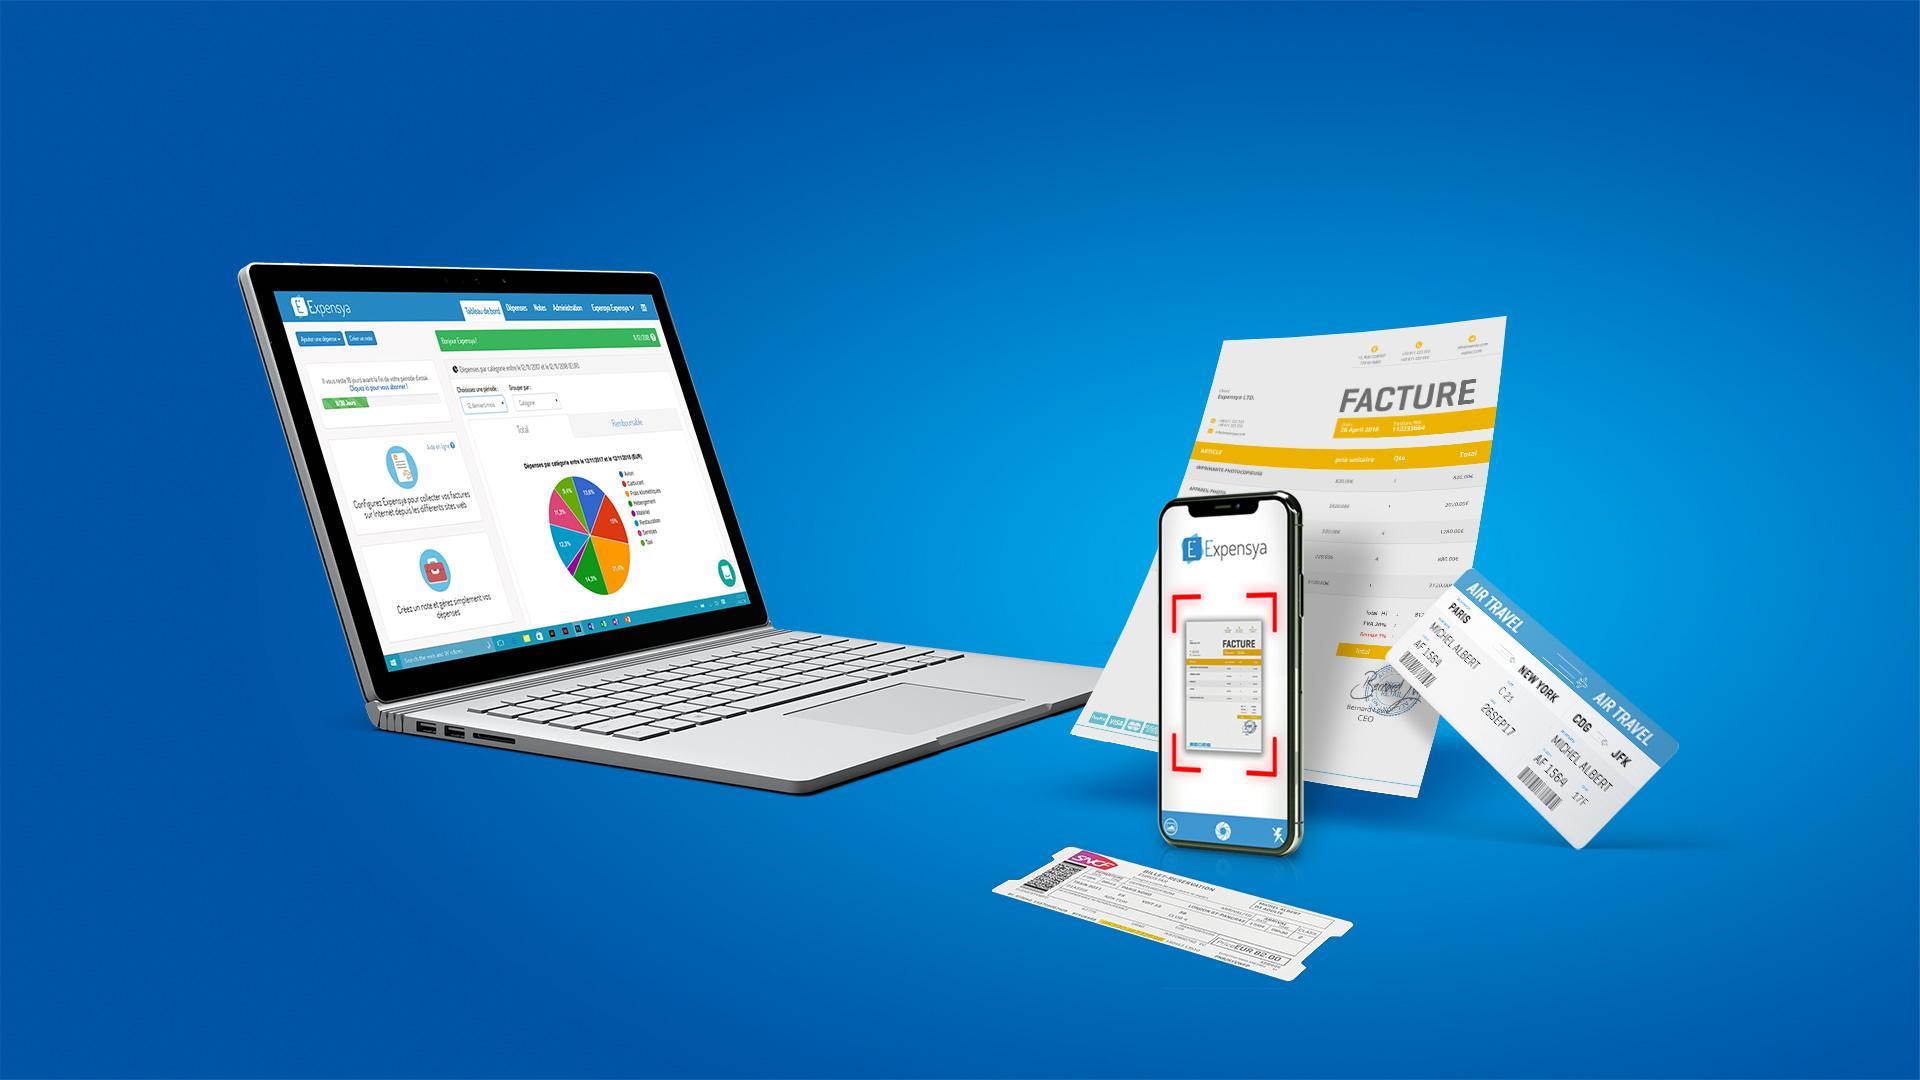 Expensya-Expensya Web et mobile 1 (small)